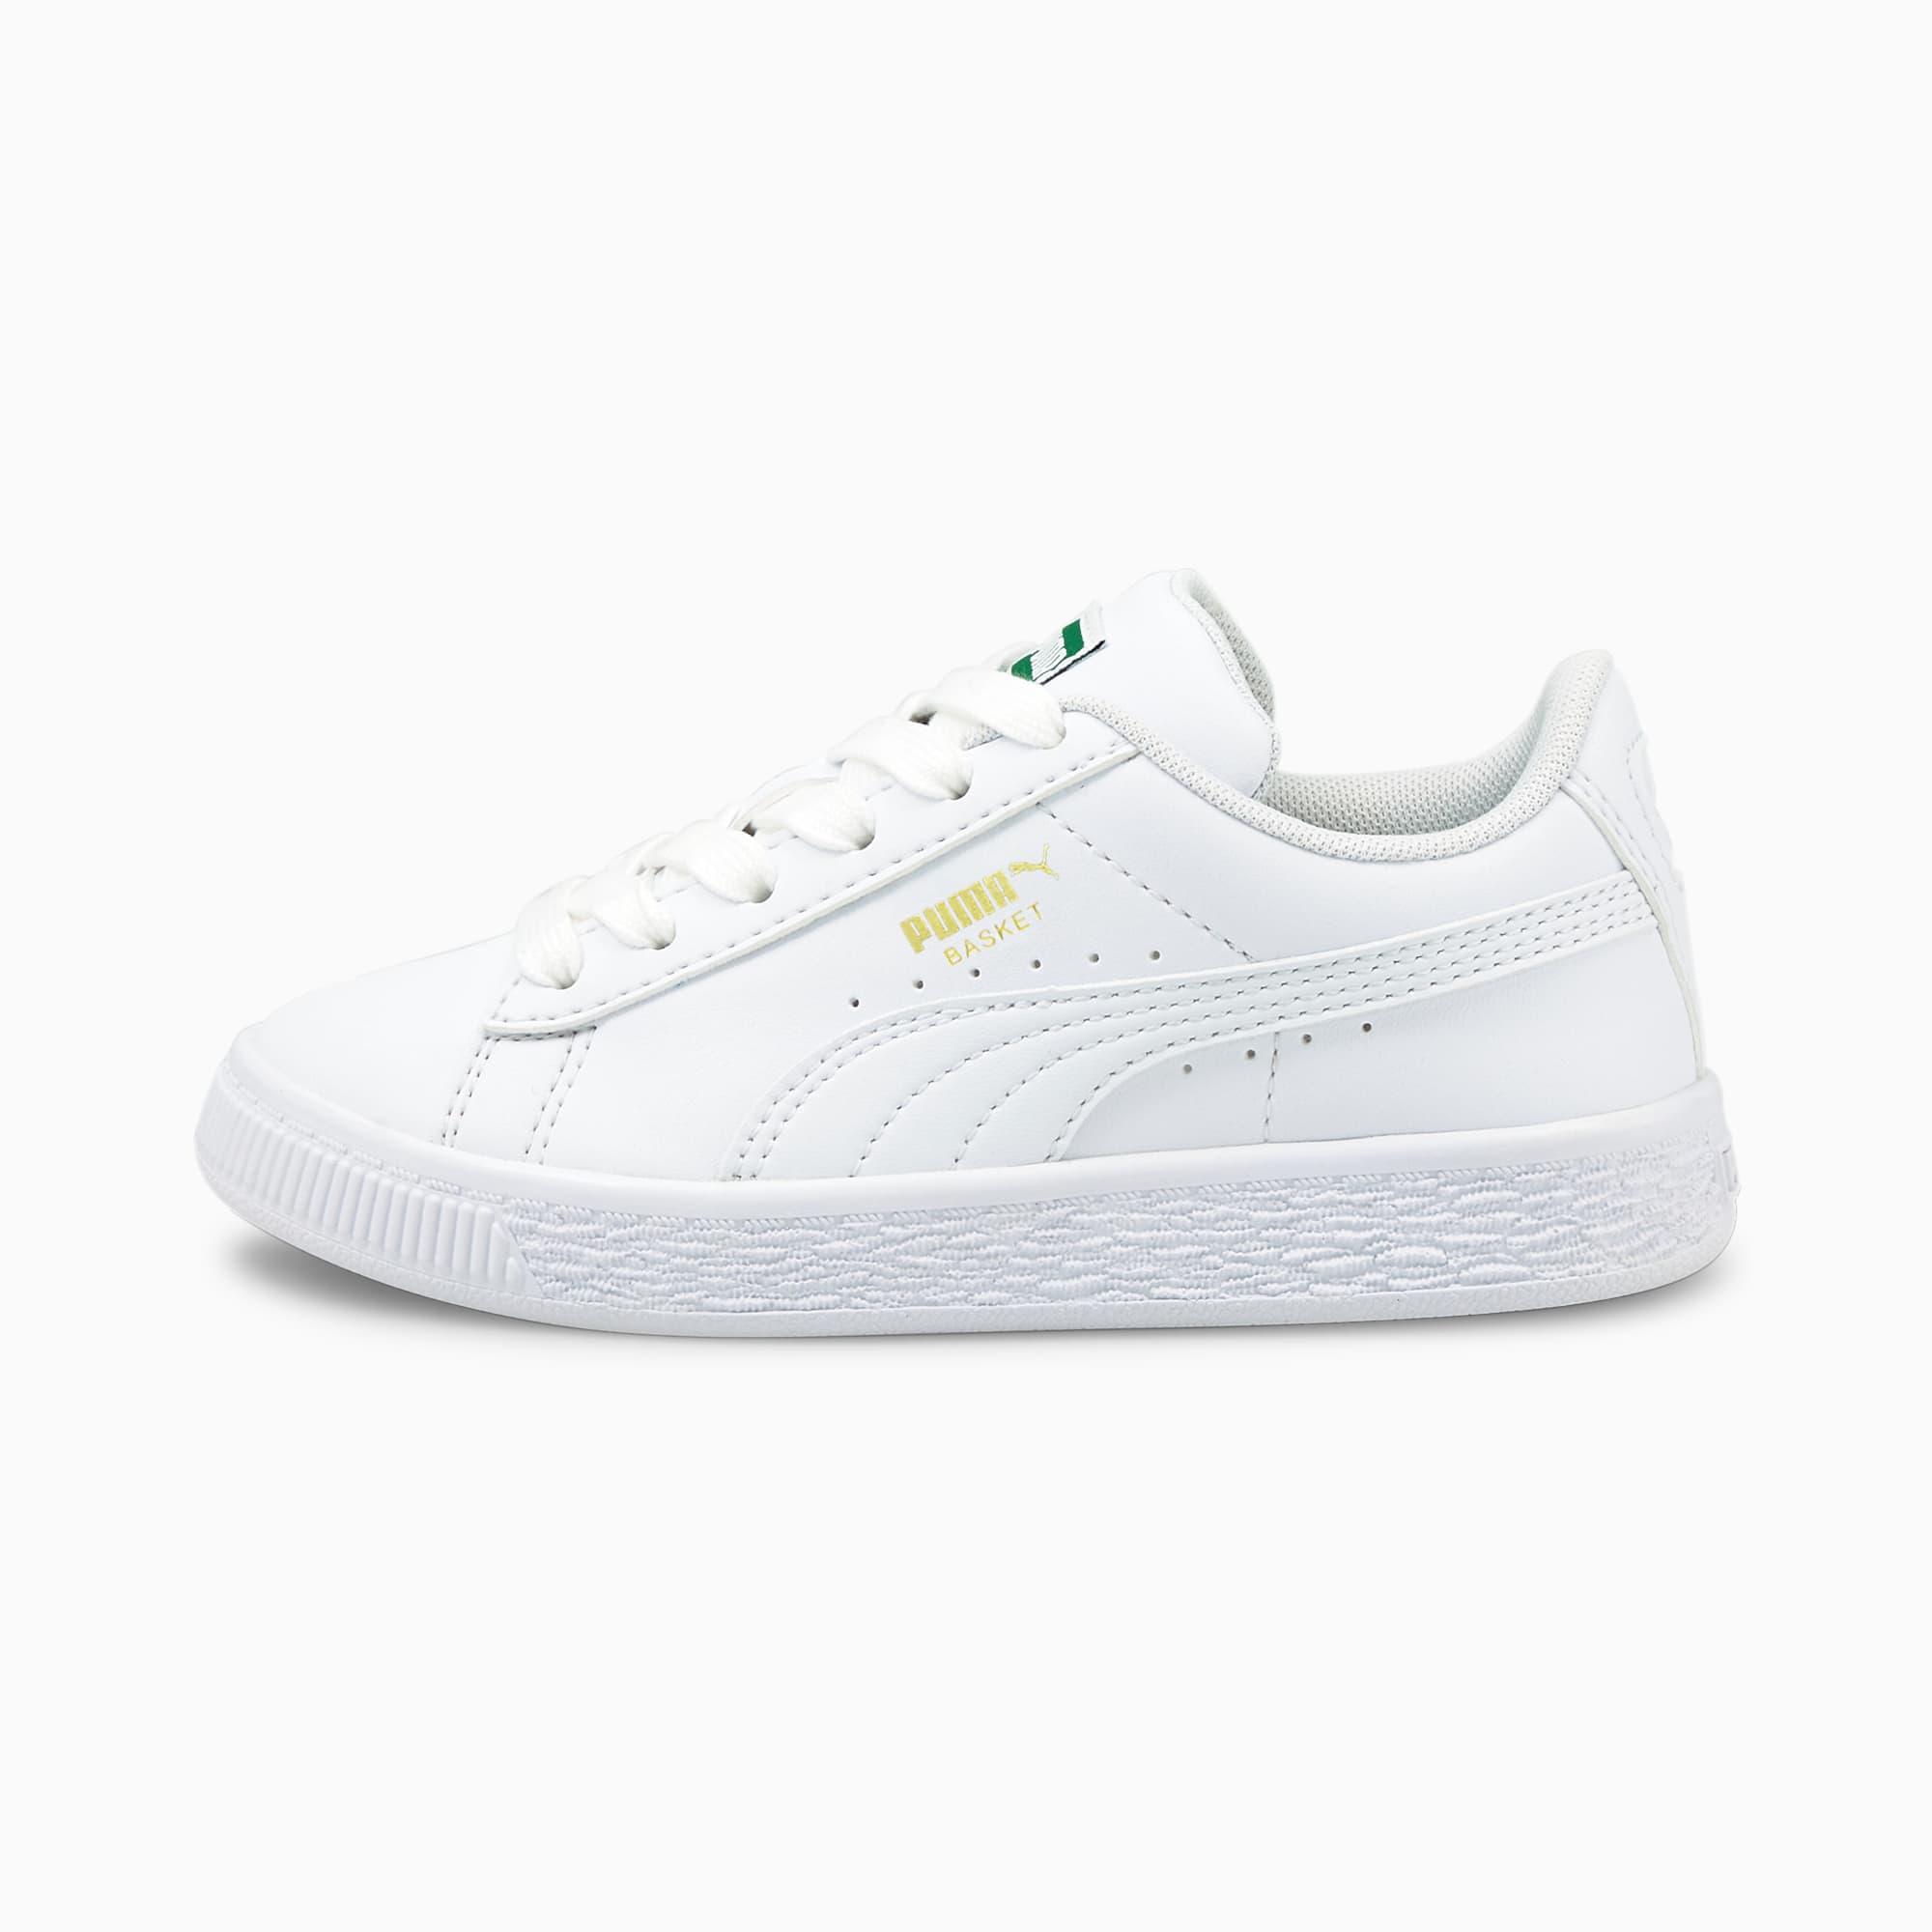 Basket Classic XXI Kids' Trainers   Puma White-Puma White   PUMA Shoes    PUMA United Kingdom